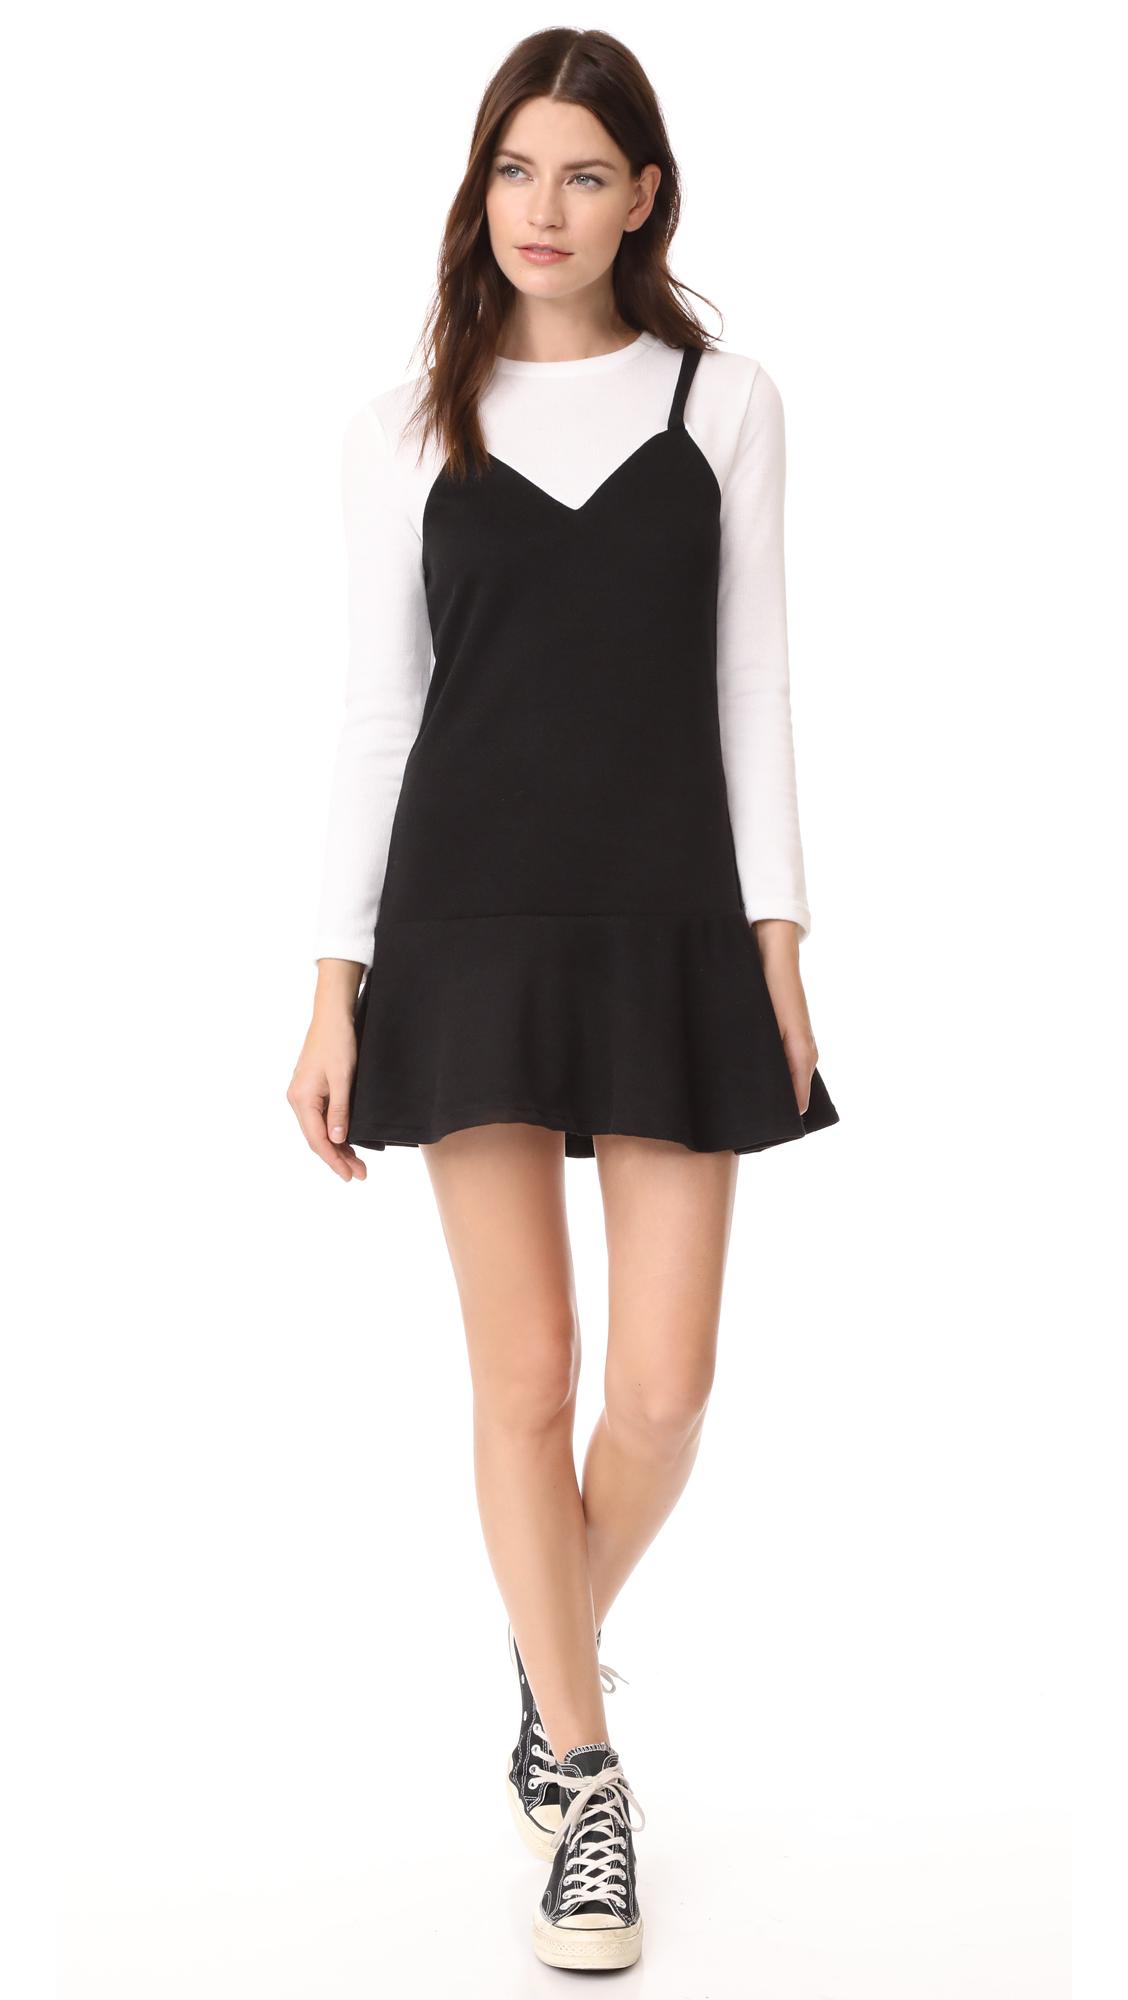 ENGLISH FACTORY Ruffle Hem Sweater Dress - Black/White